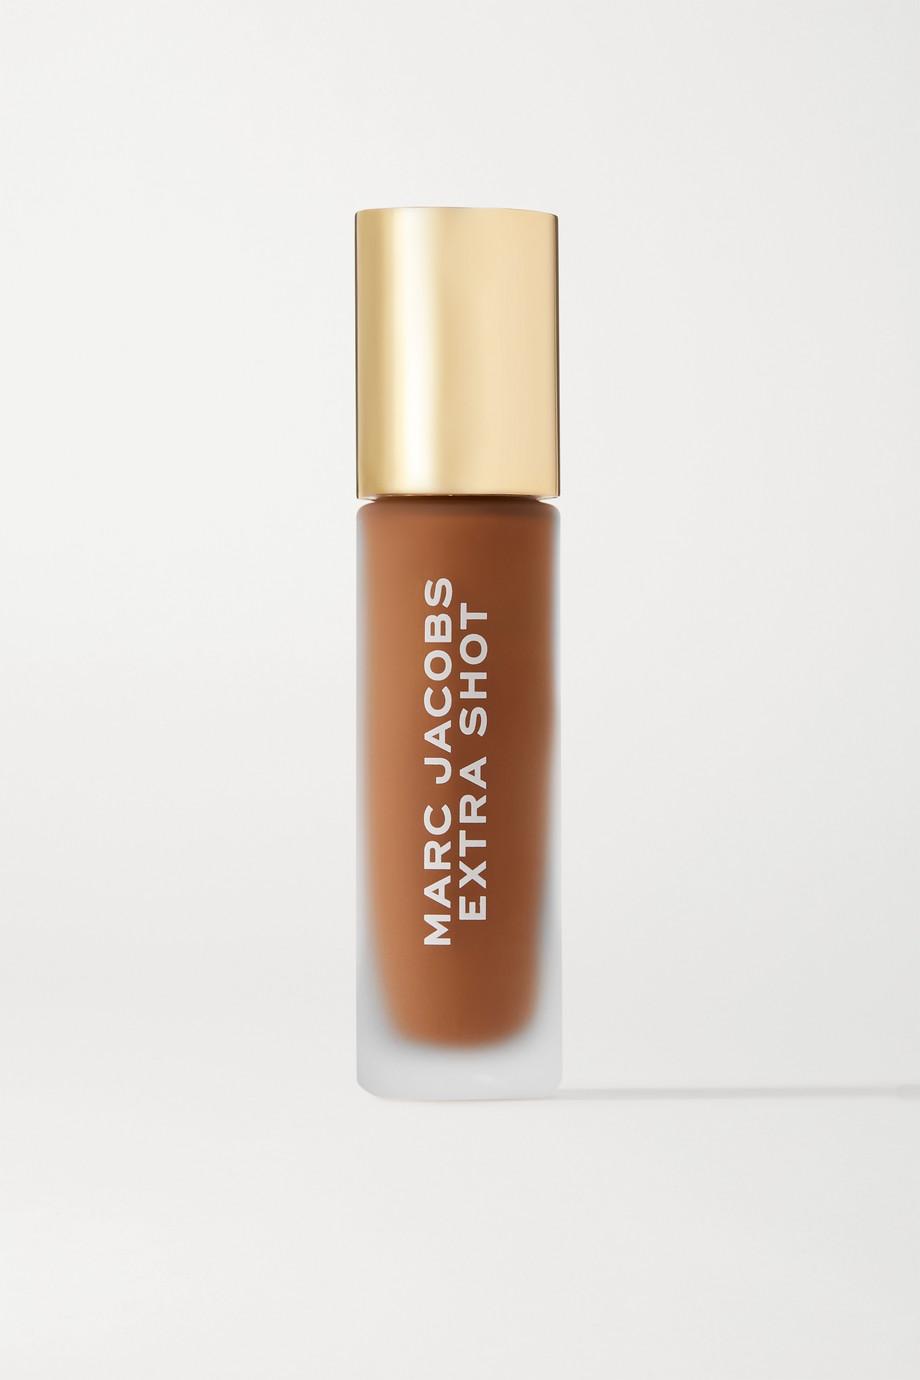 Marc Jacobs Beauty Café Extra Shot Youthful Look Longwear Concealer - Tan 390, 15ml